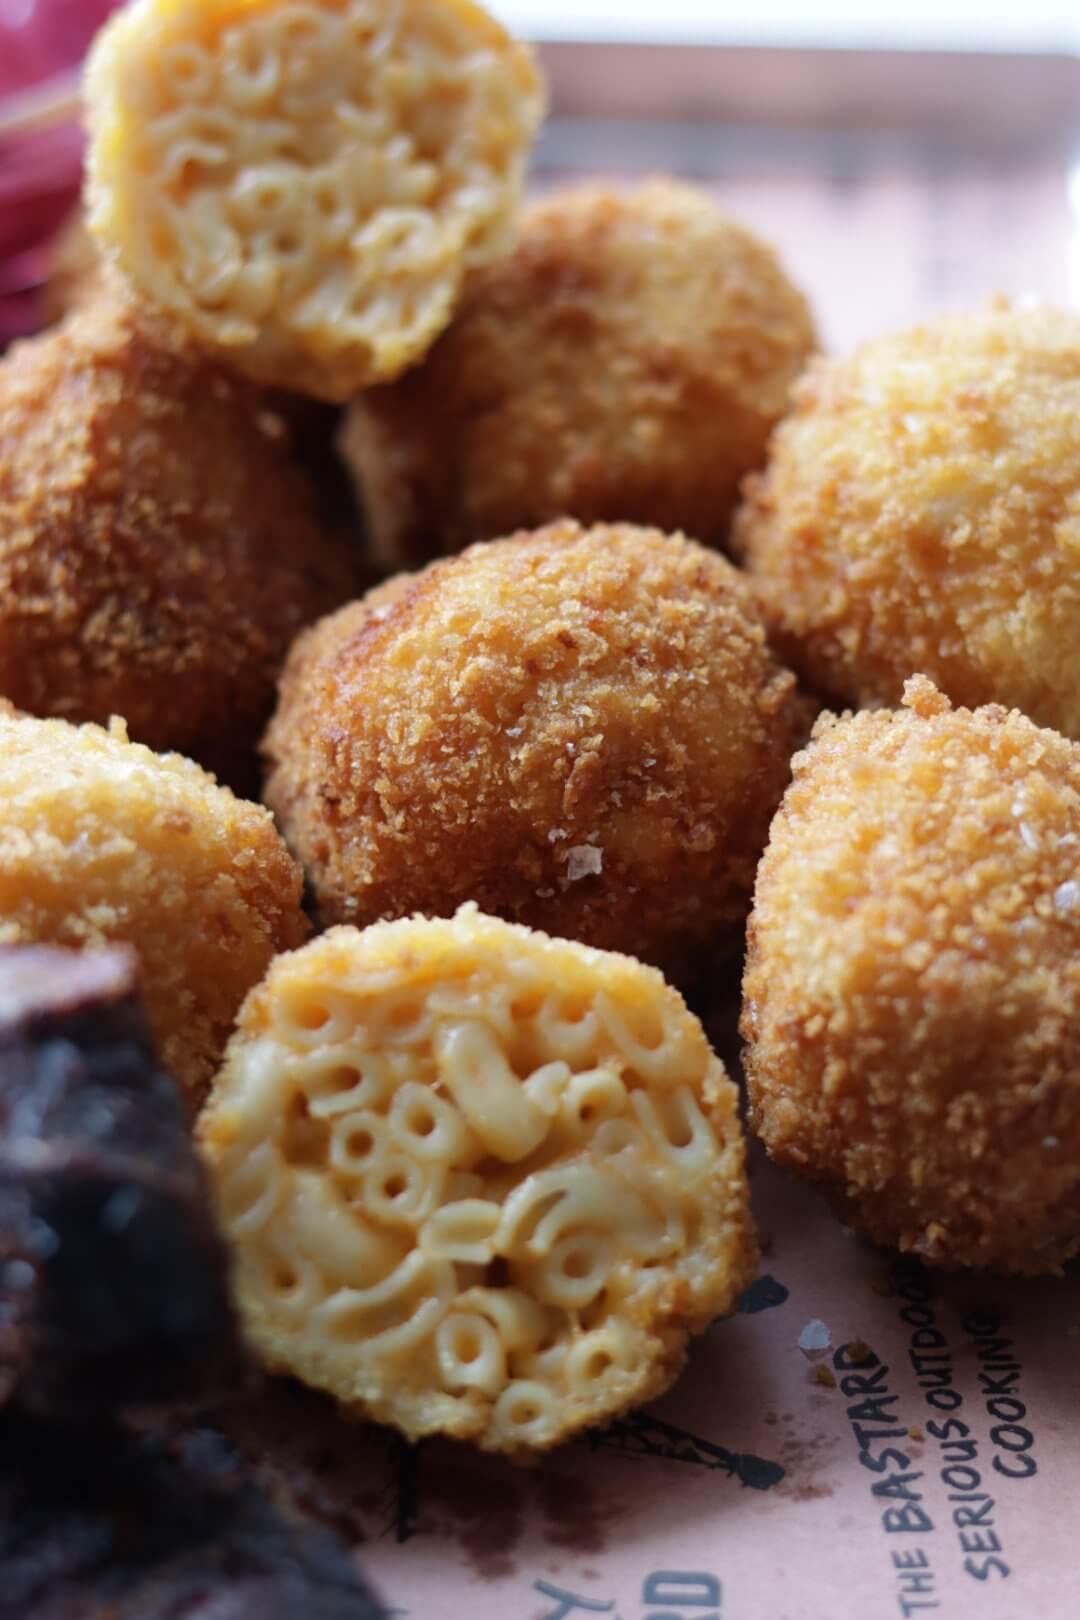 Mac 'n cheese bitterballen